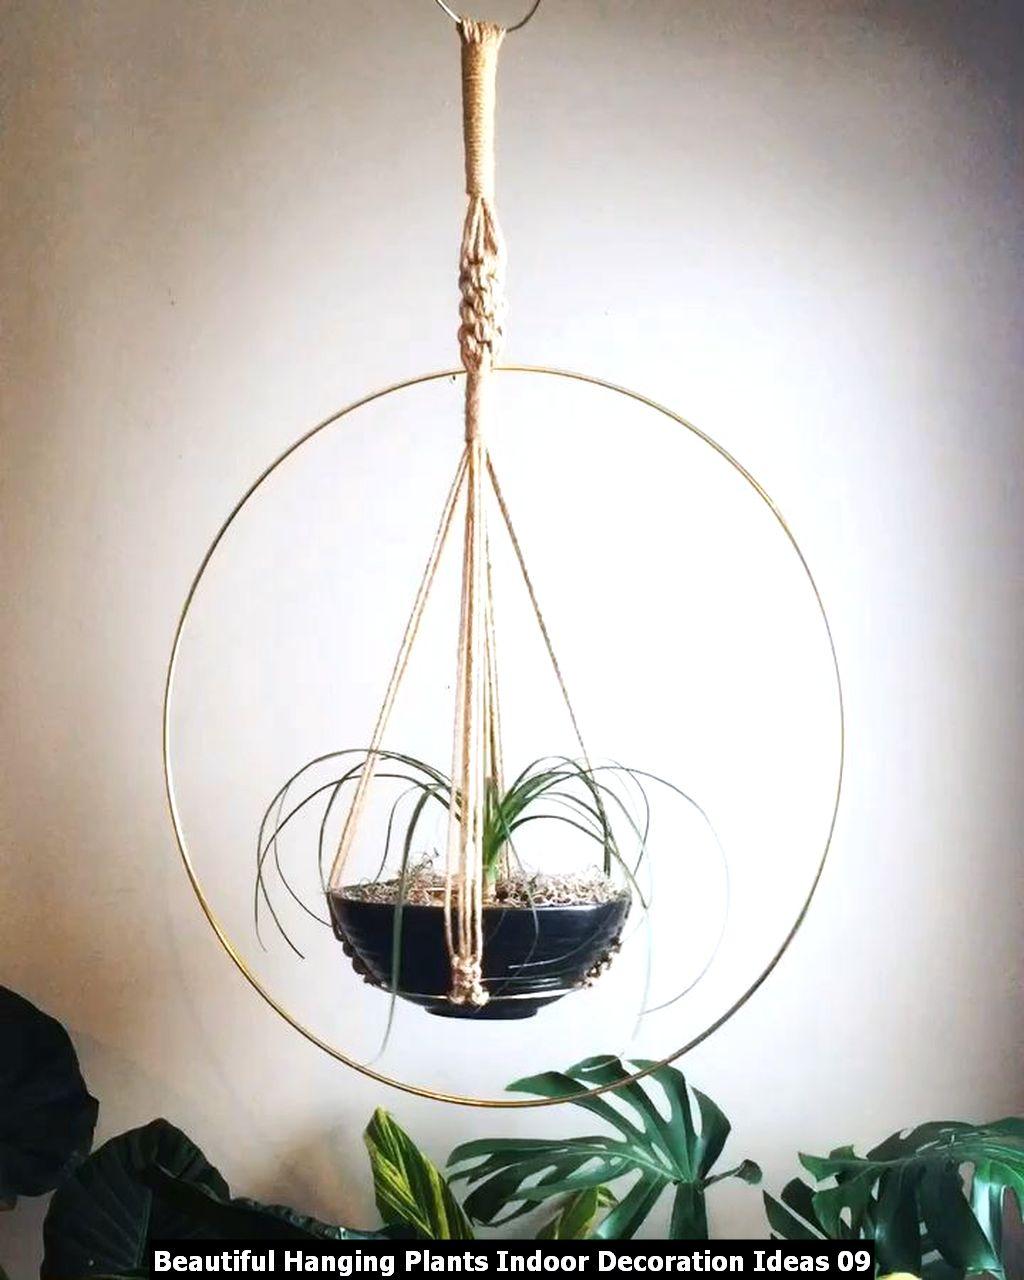 Beautiful Hanging Plants Indoor Decoration Ideas 09